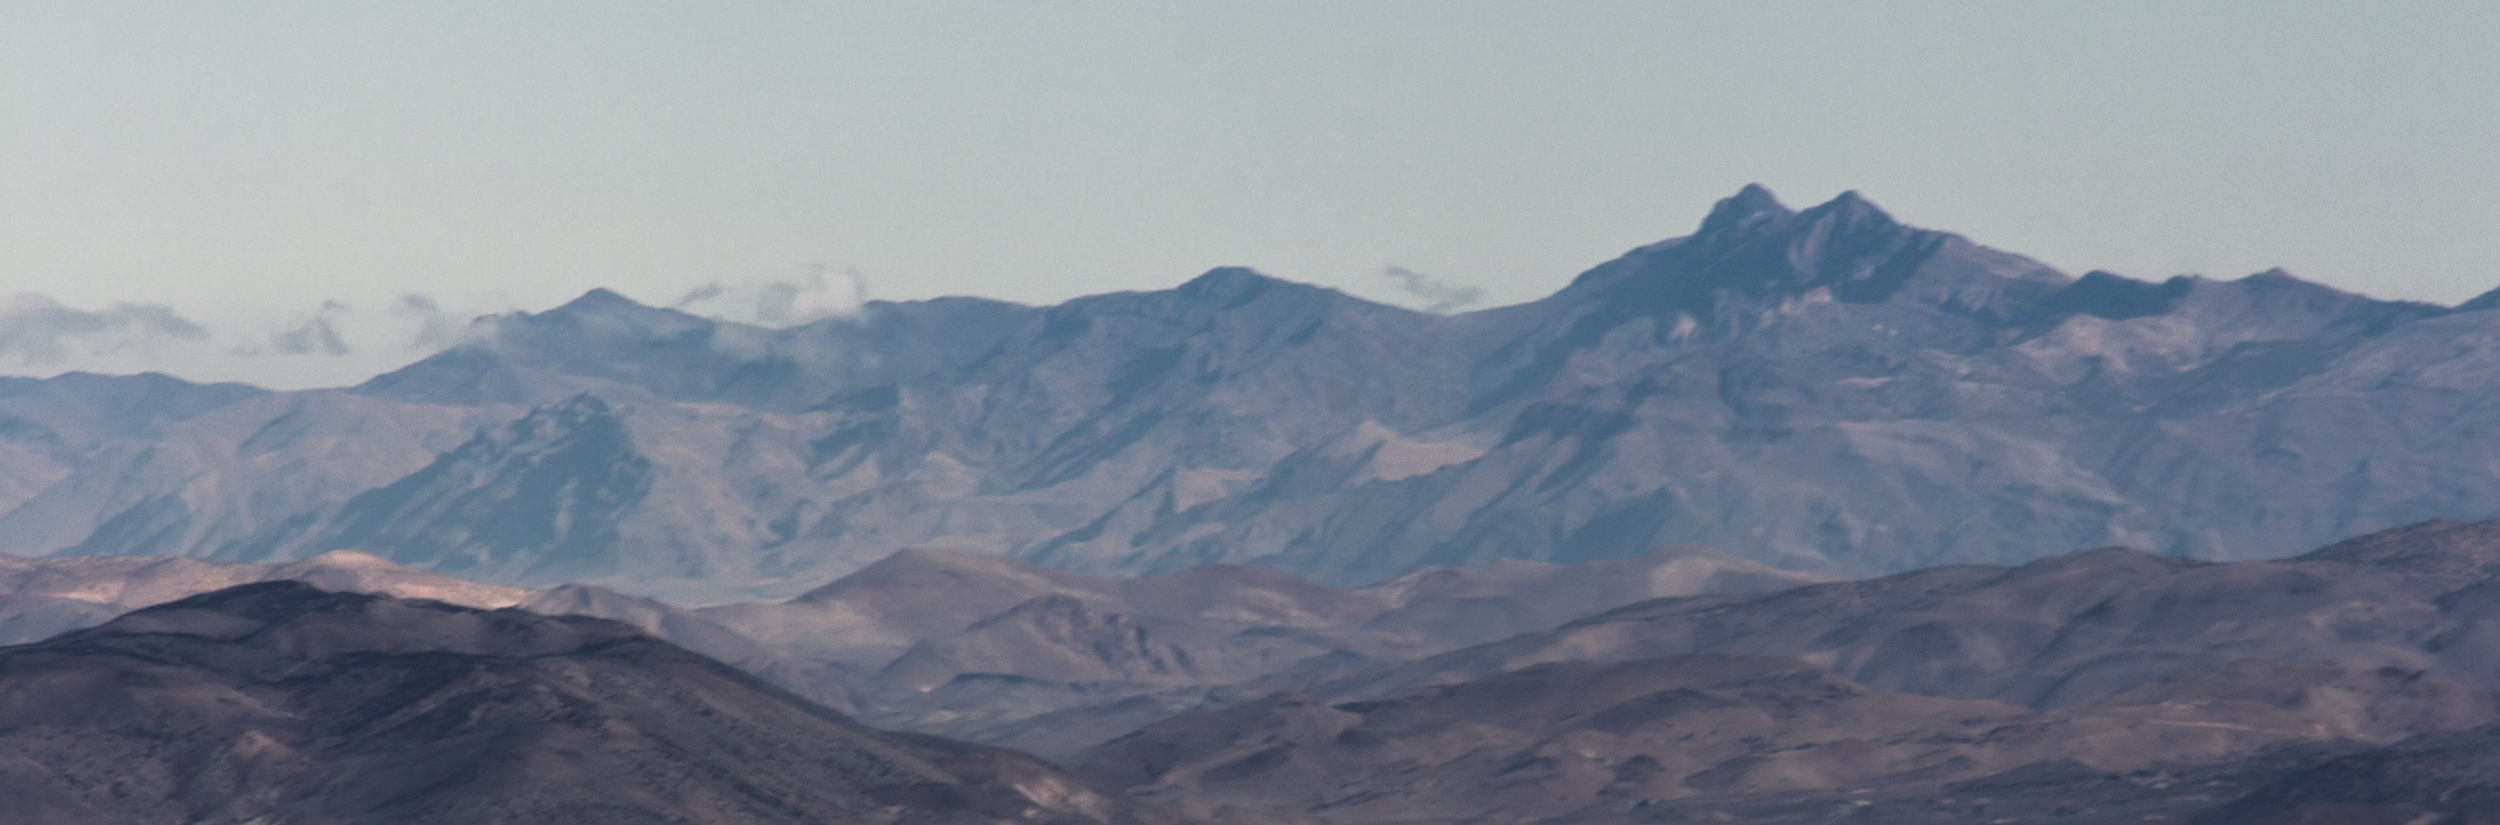 Reno-10.jpg